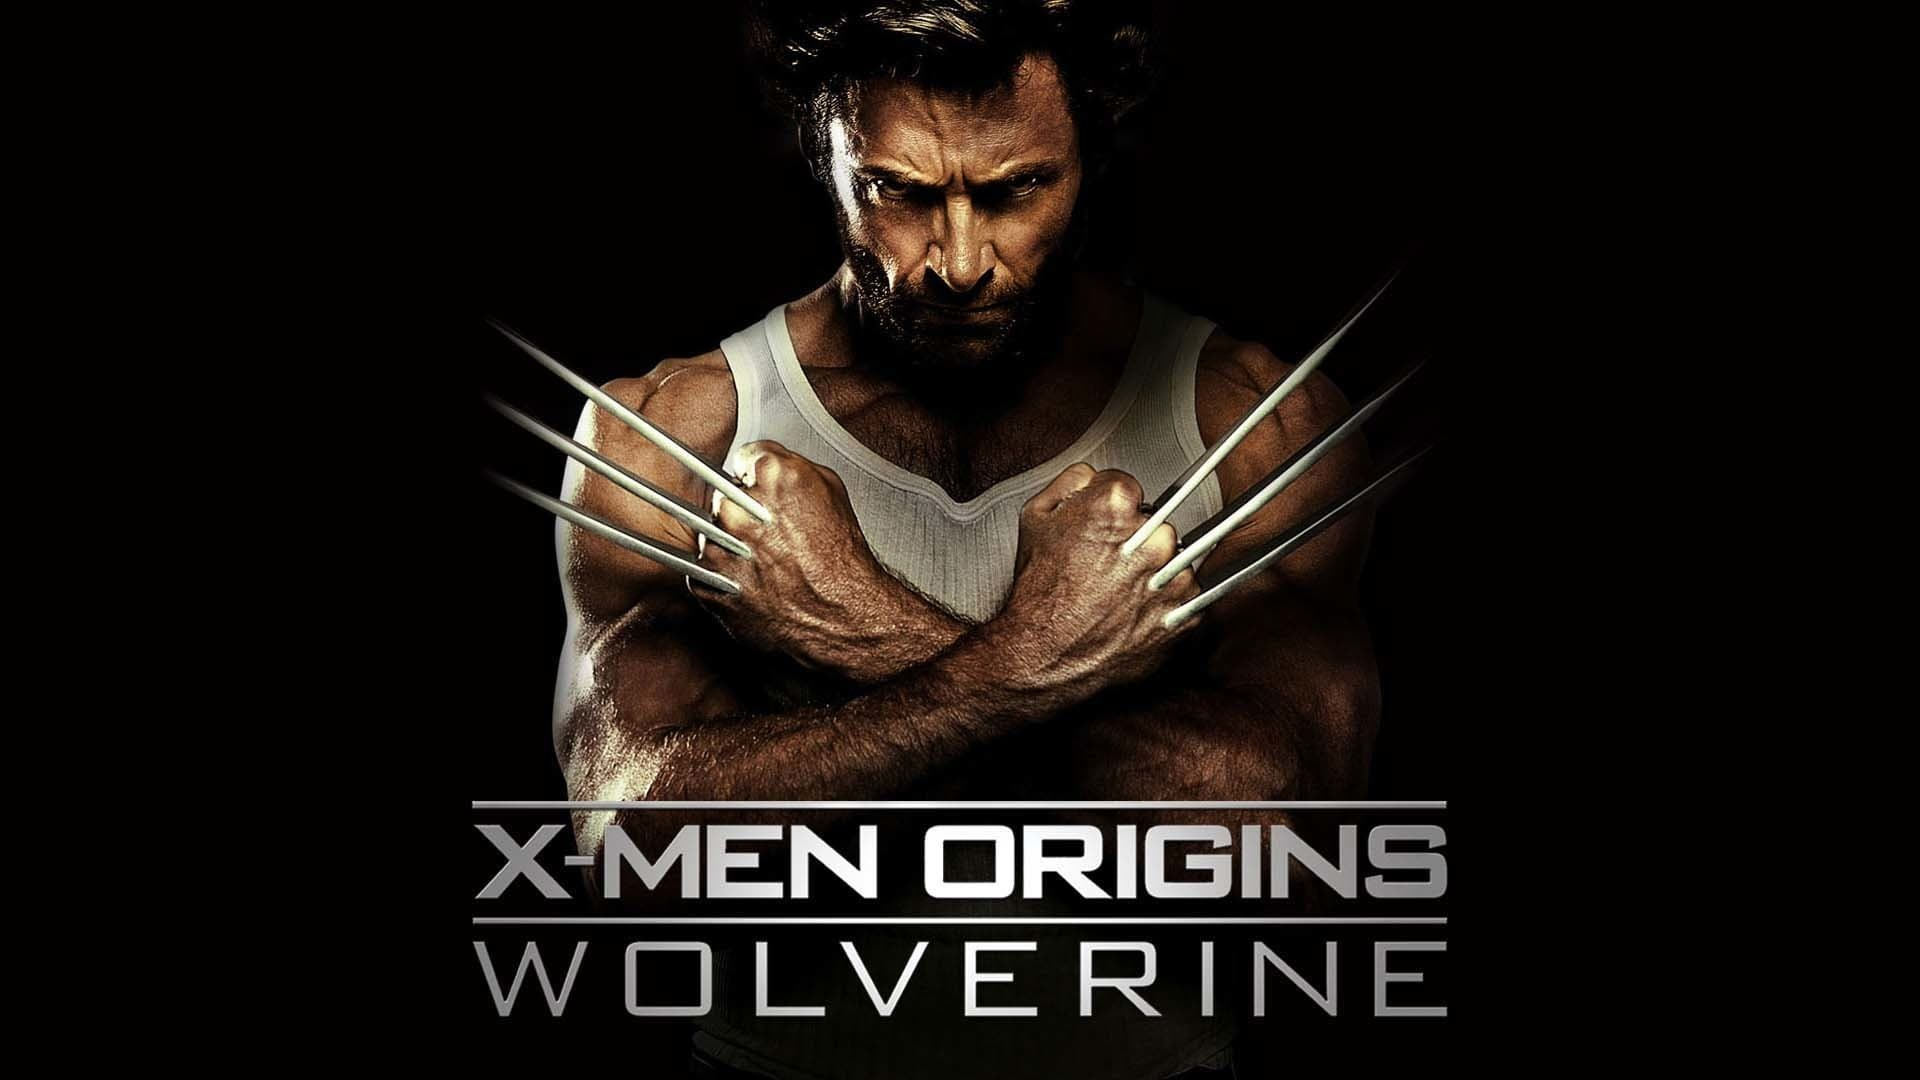 X-MEN 4 Origins Wolverine กำเนิดวูลฟ์เวอรีน (2009)